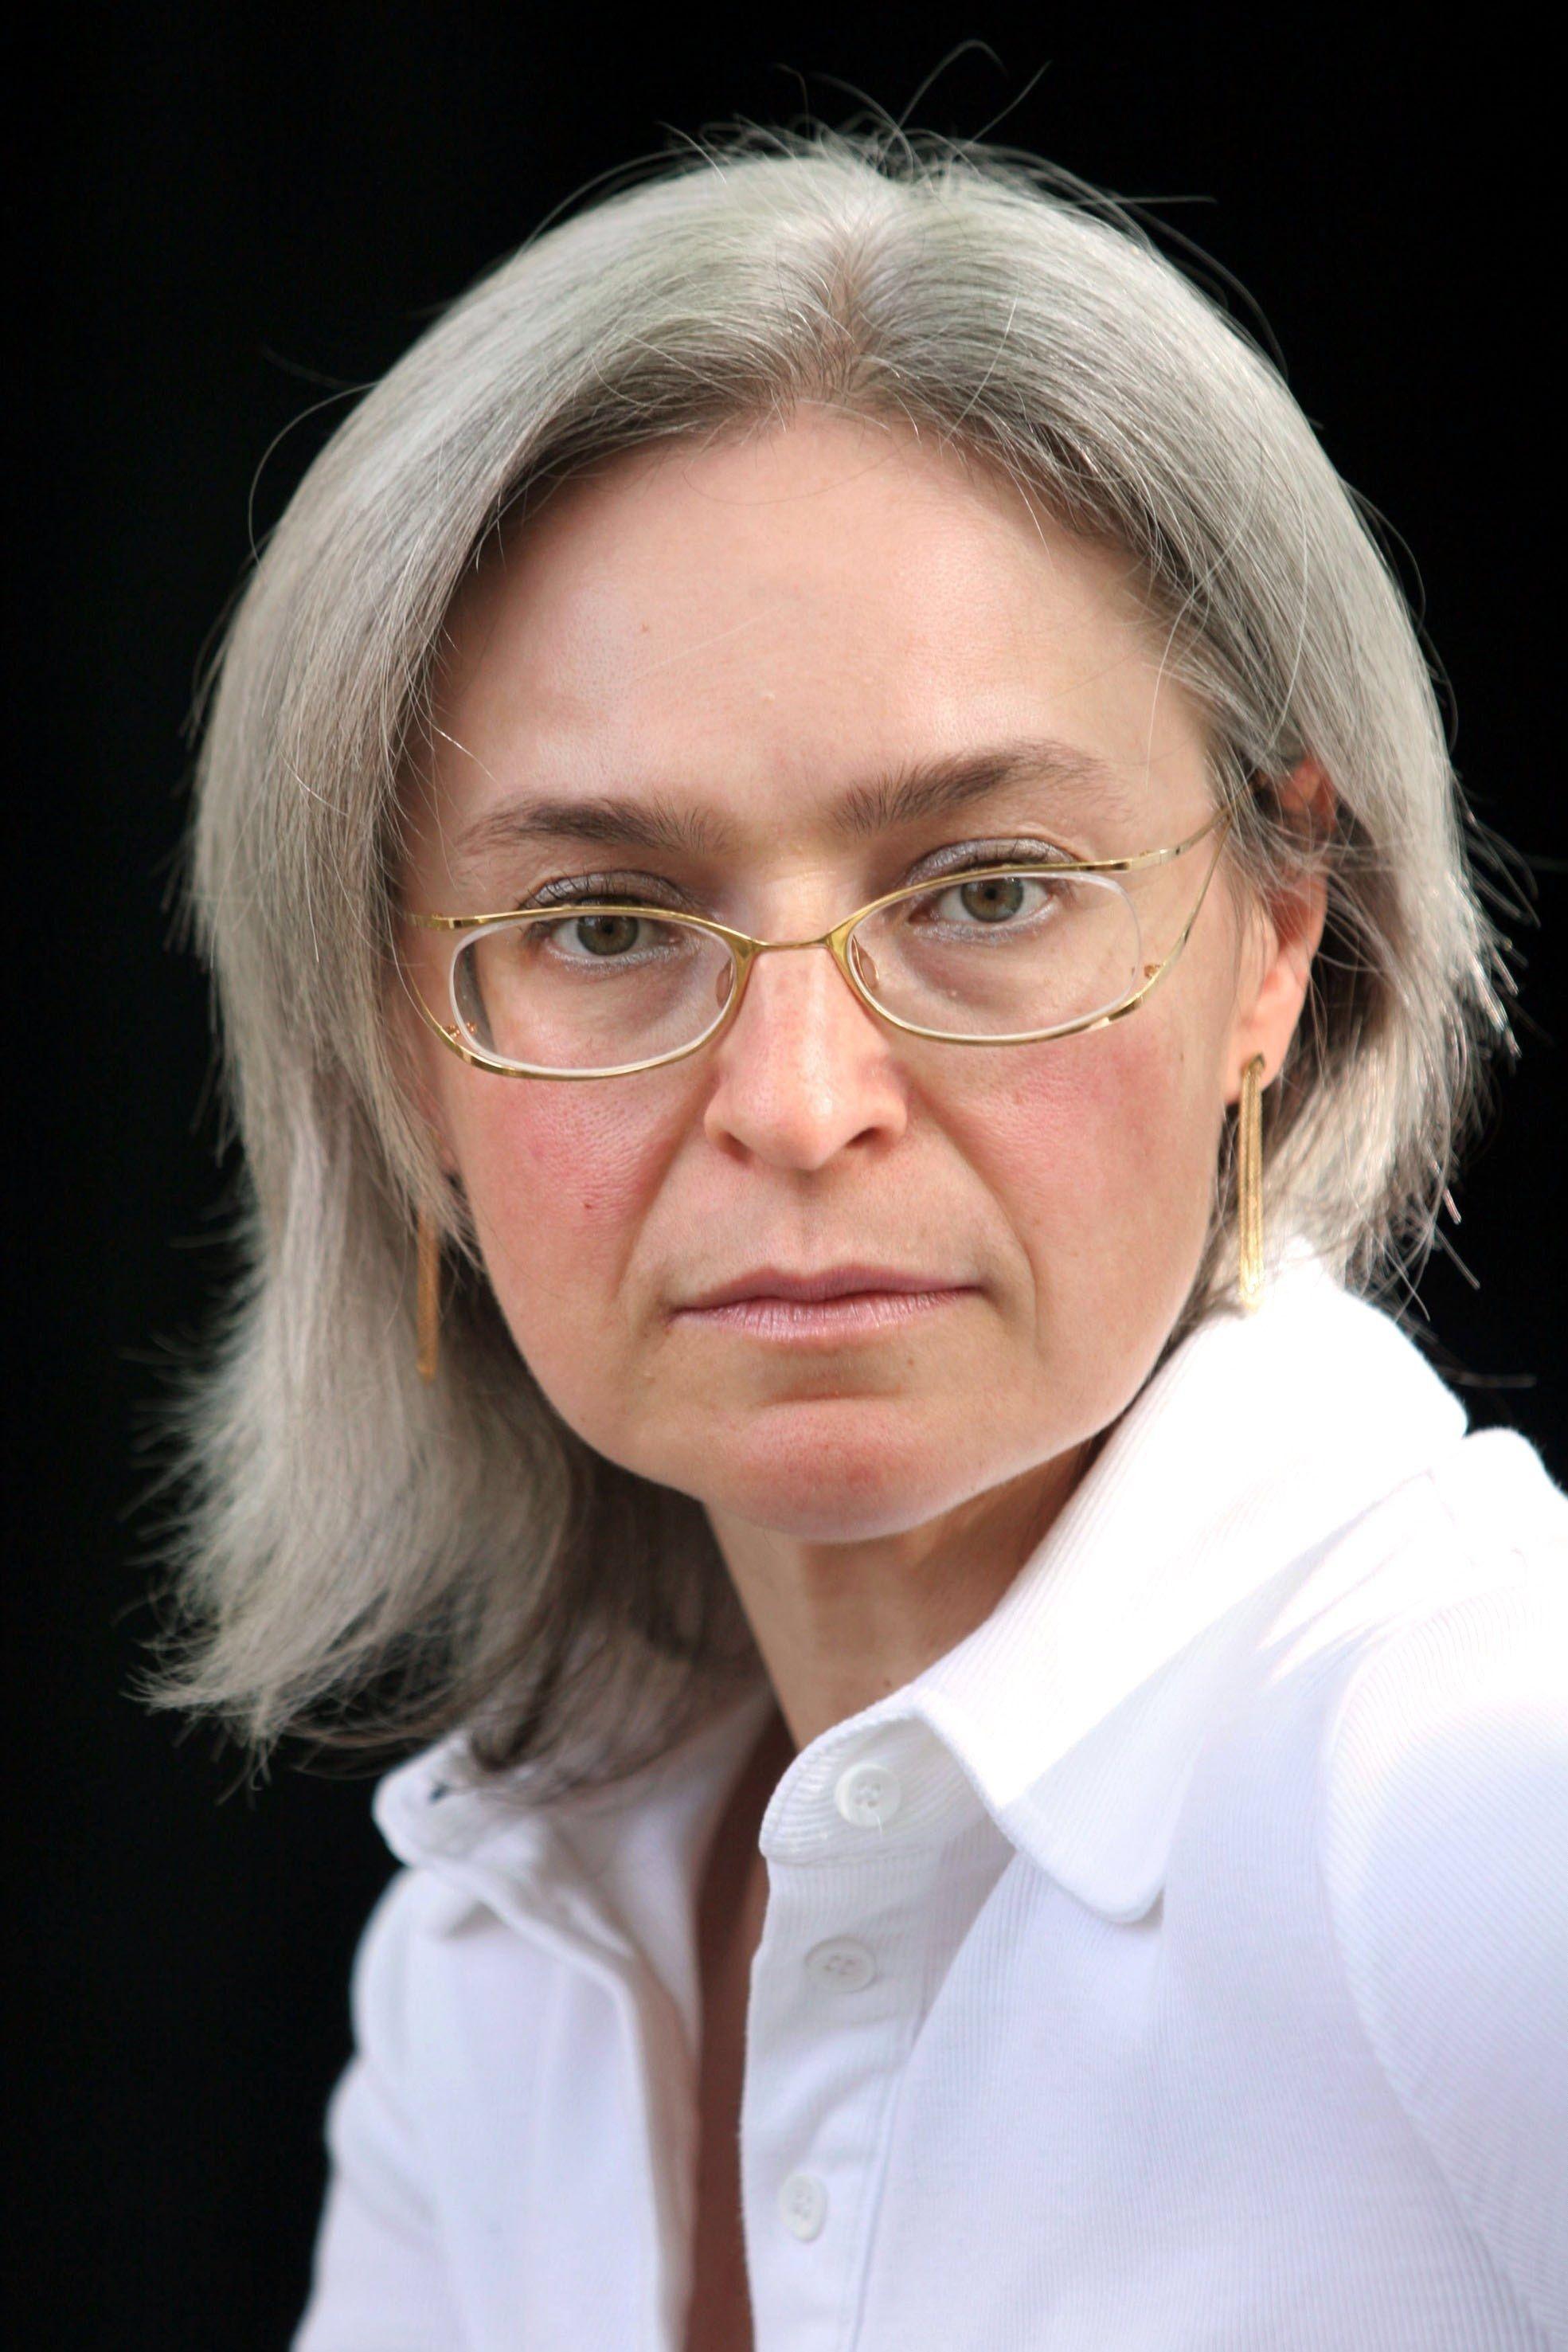 Anna Stepanovna Politkovskaya (born: New York City, 30 August 1958- assassinated: